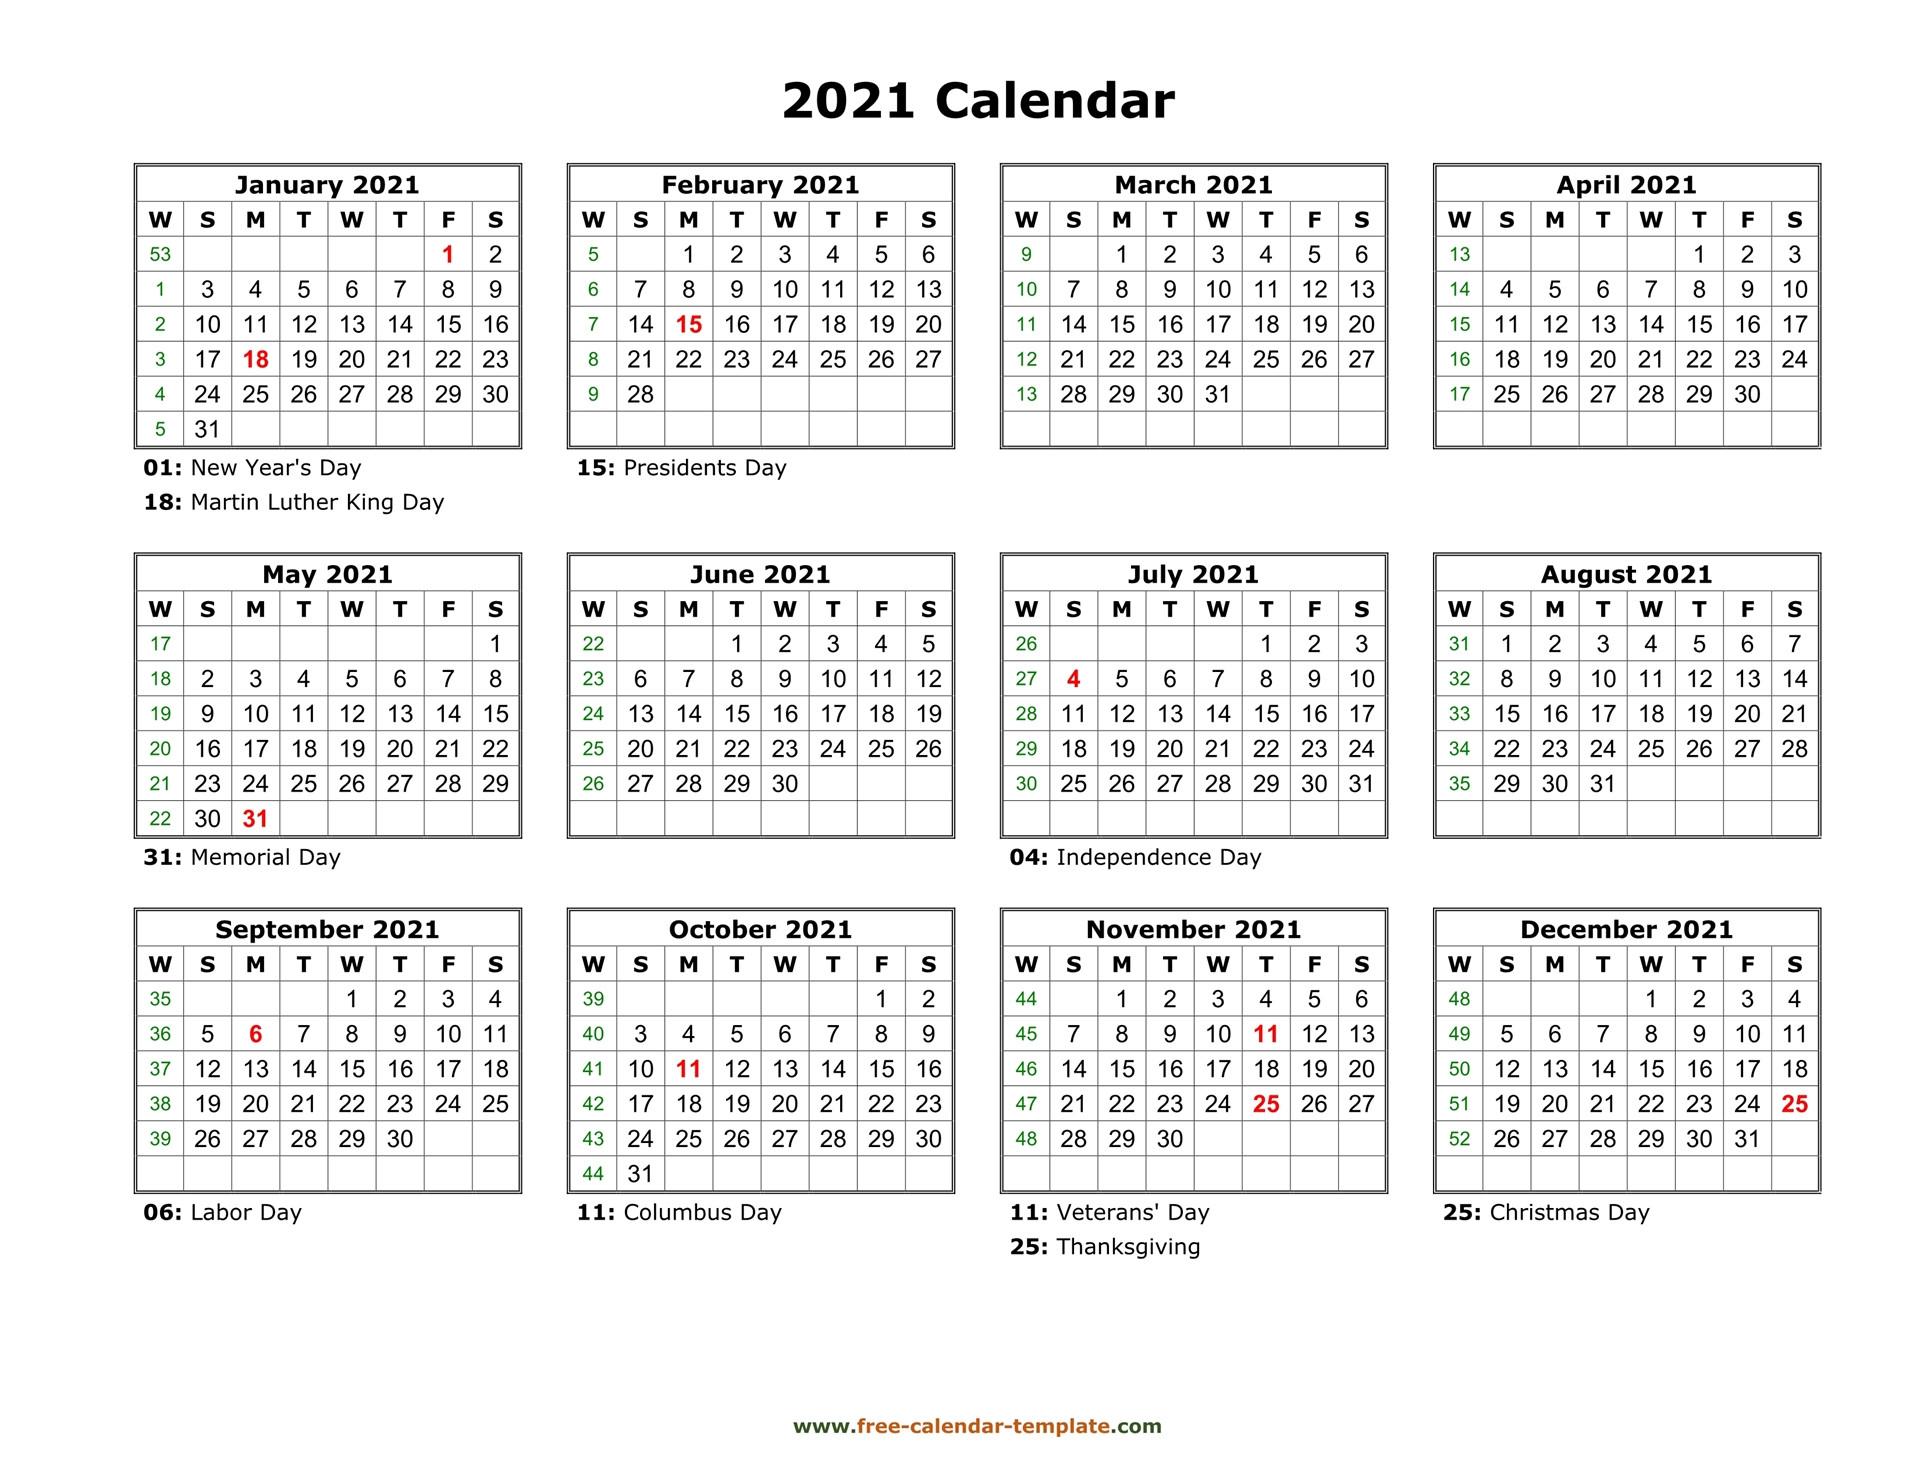 Printable Yearly Calendar 2021 | Free-Calendar-Template  2021 2021 Monthly Calendar Printable Free